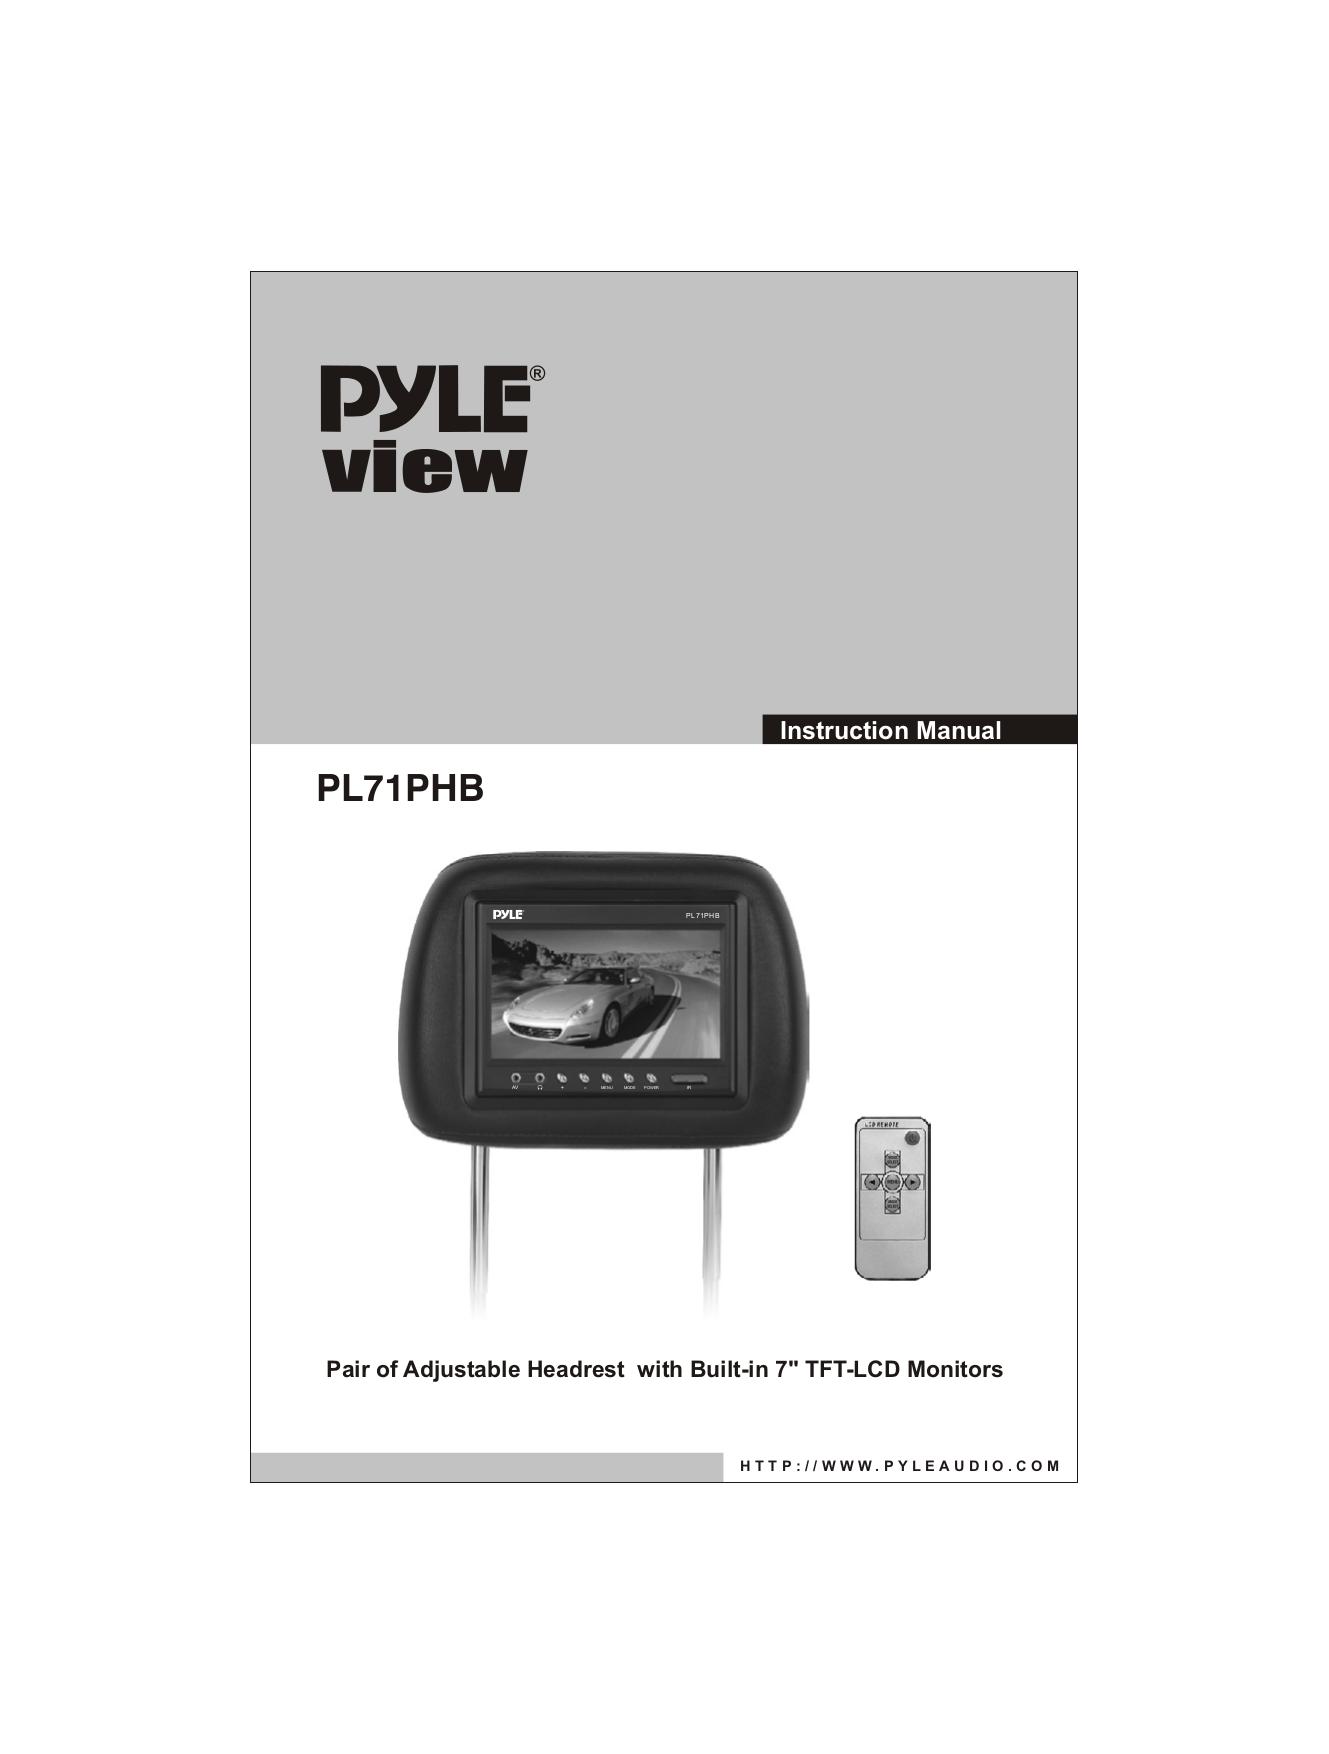 Pyle Pltsn74 Wiring Diagram Page 2 And Schematics Pldn74bti Yamaha Pacifica 112 Source Free Pdf For Pl71phb Car Video Manual Rh Umlib Com Stick Shift Cars Trashing